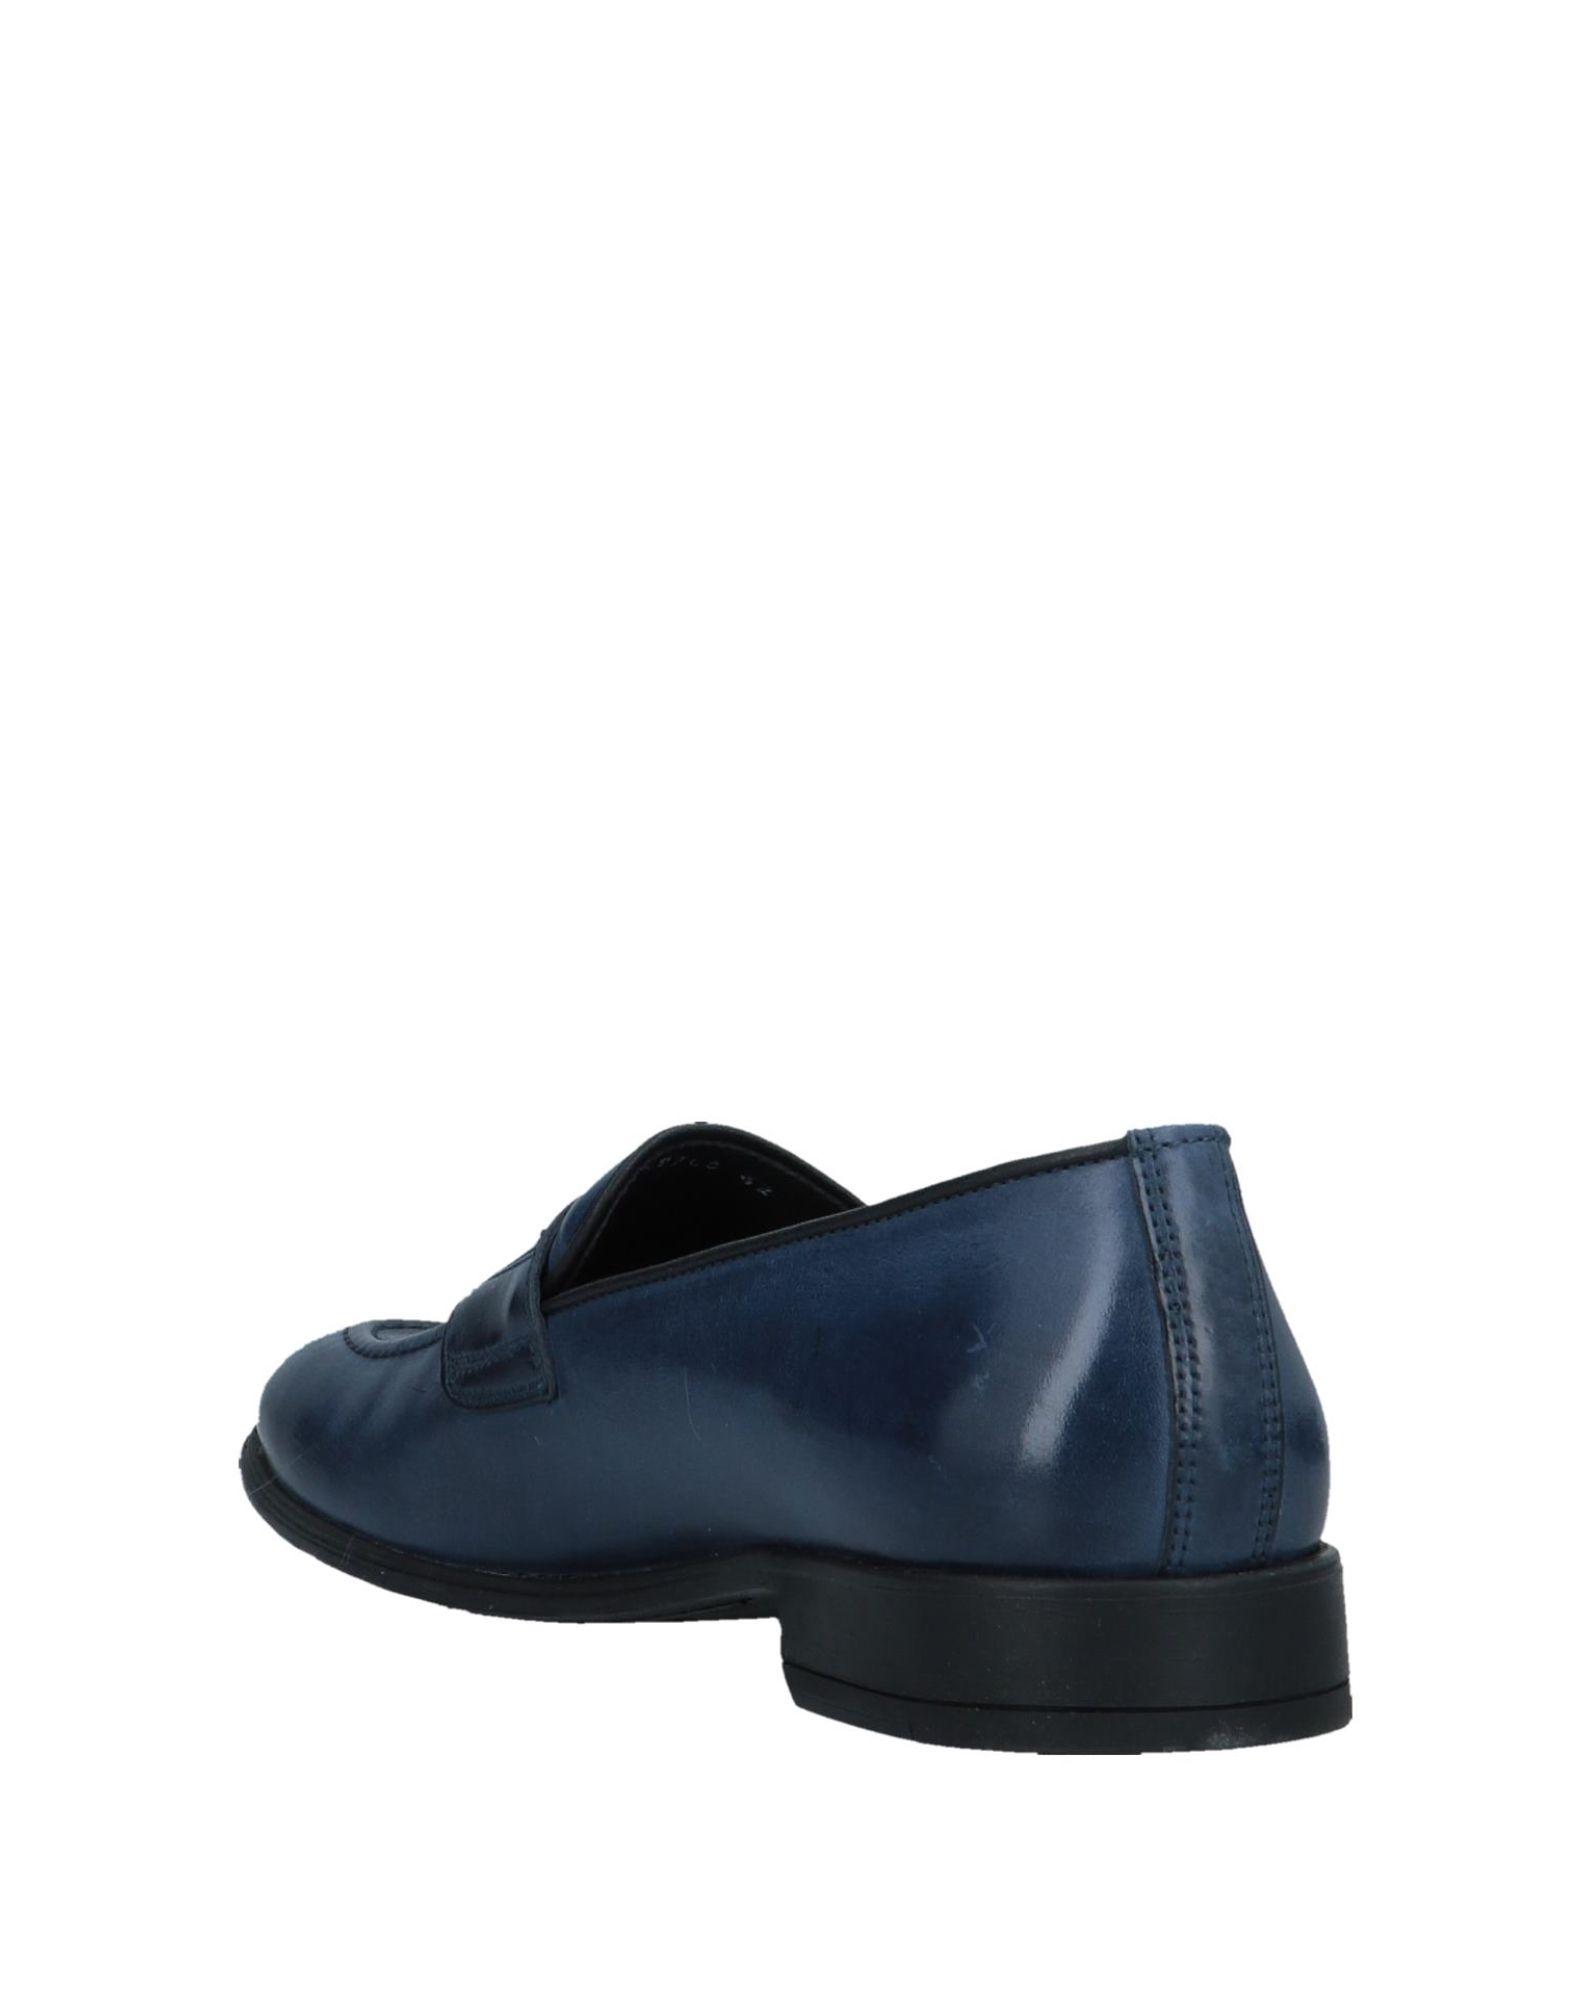 Rabatt echte Schuhe Antica Cuoieria 11557601HR Mokassins Herren  11557601HR Cuoieria 2a0402